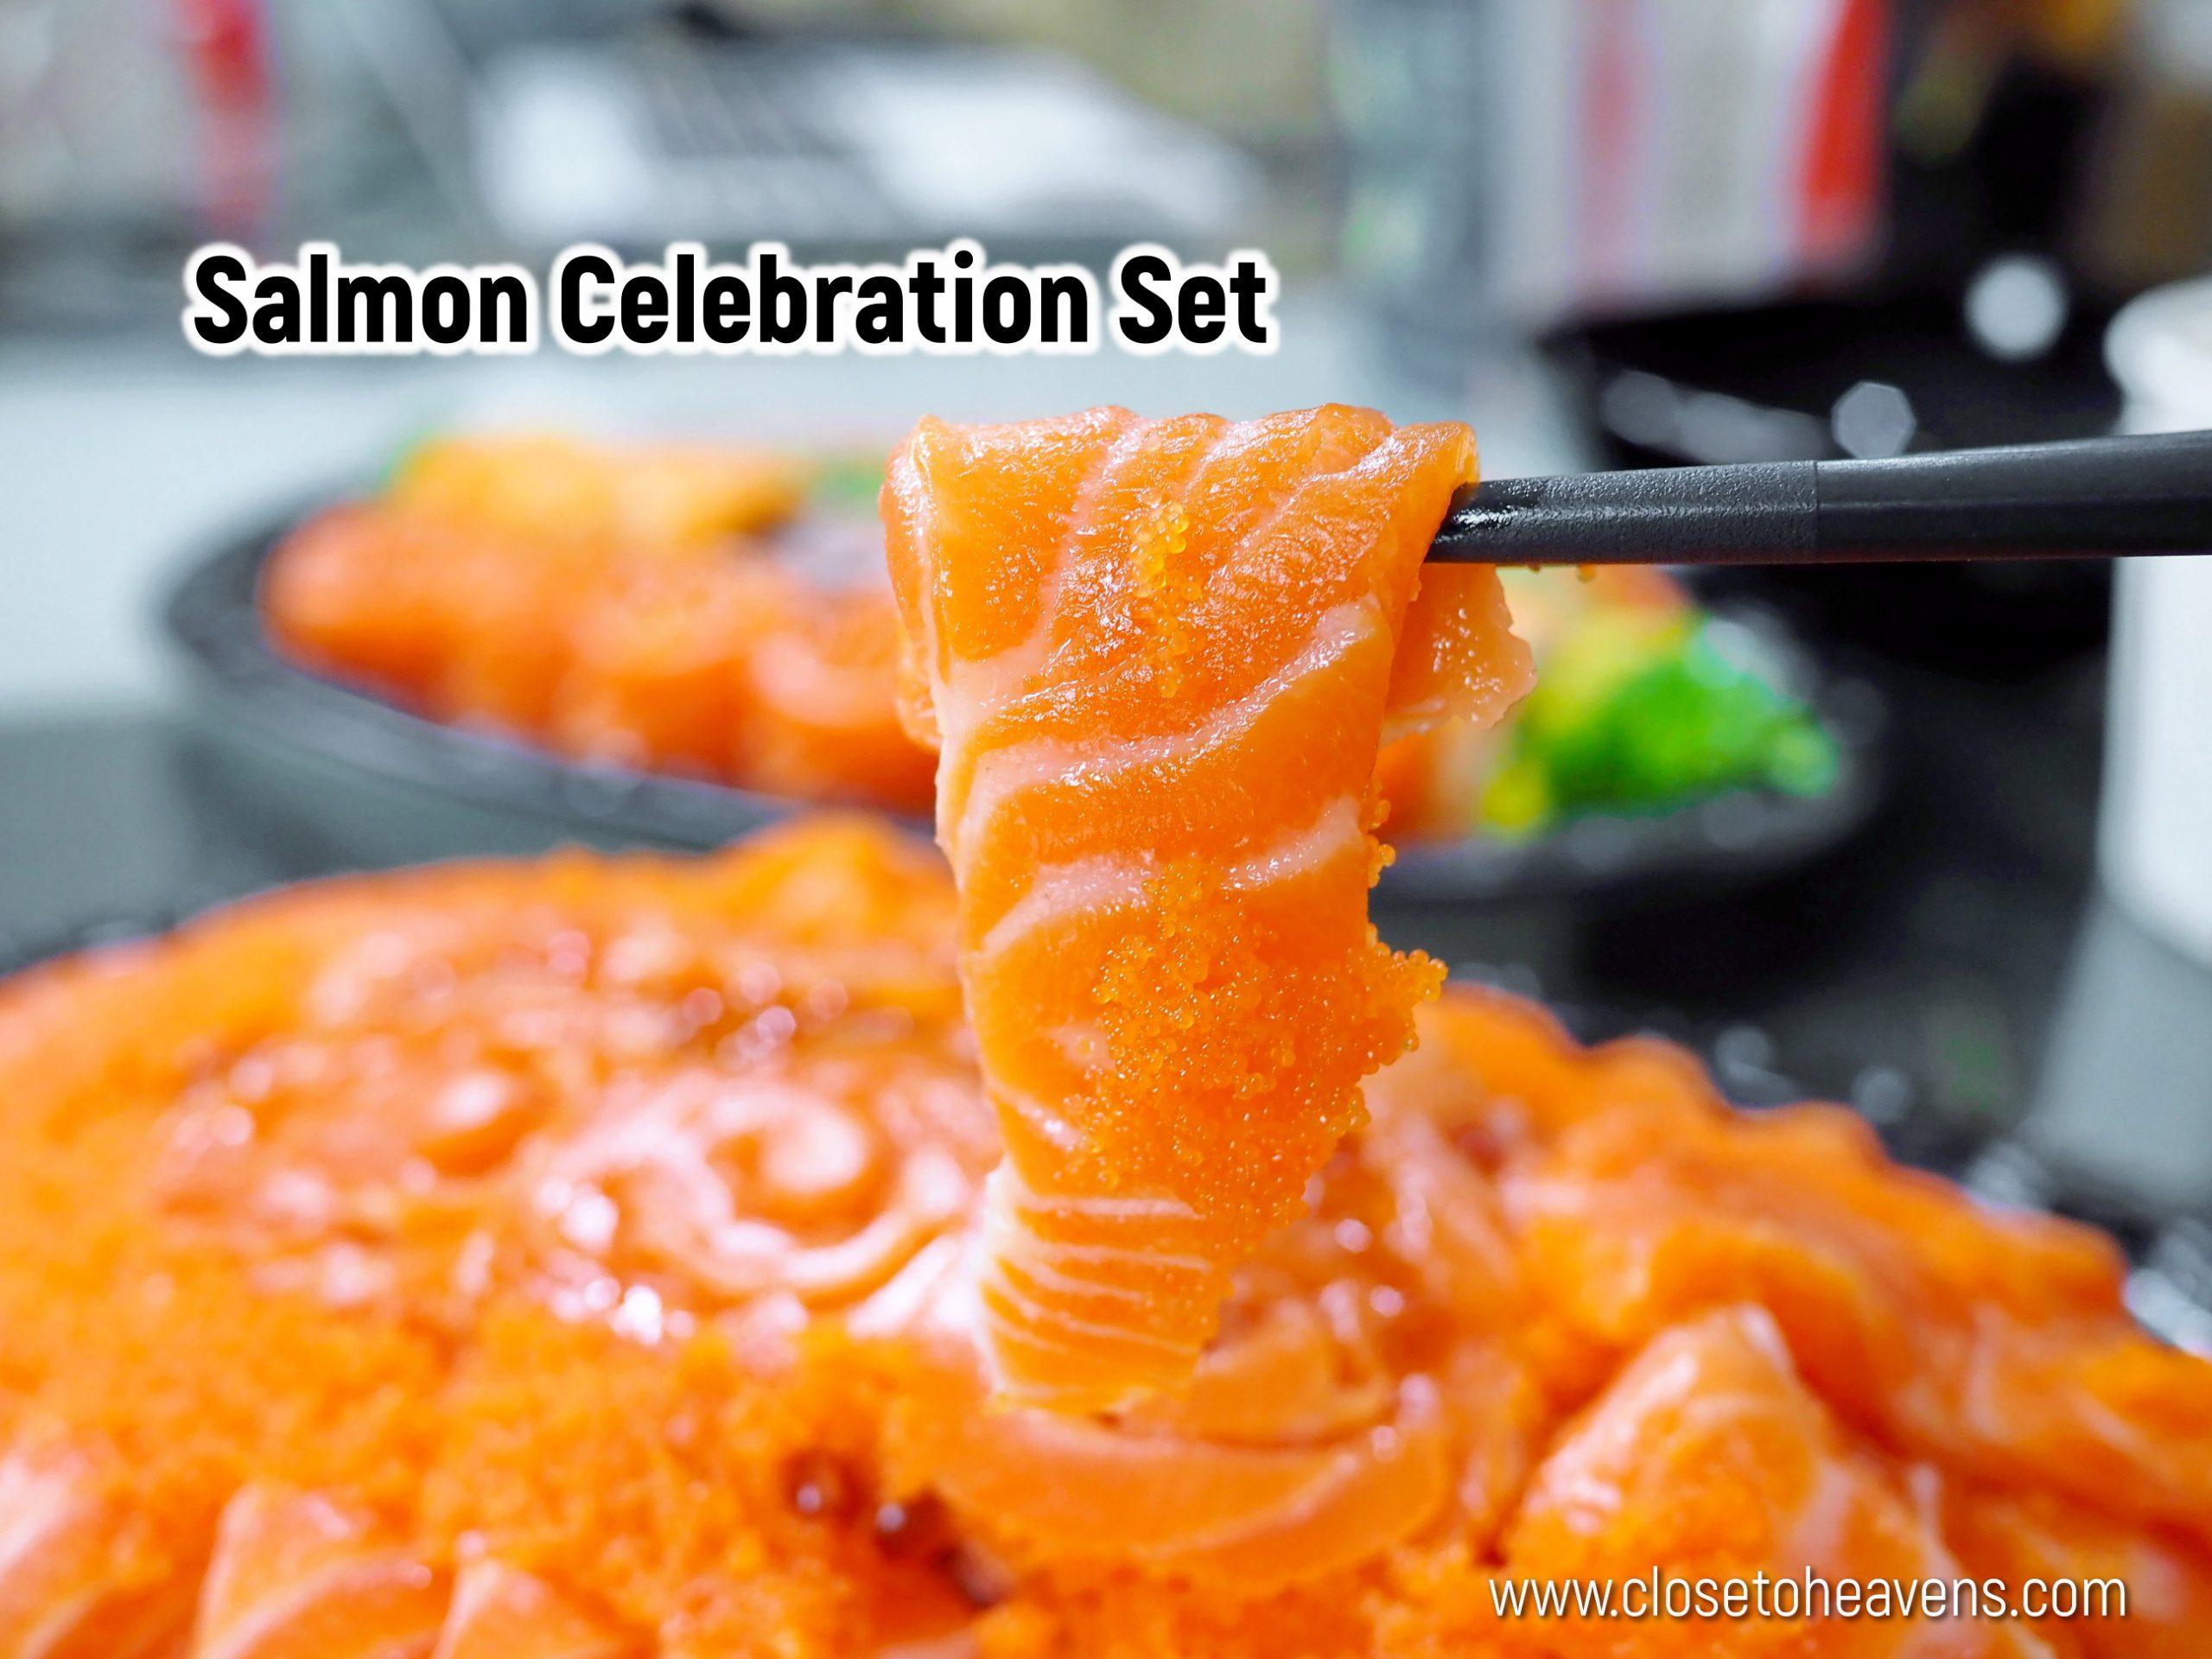 Salmon Celebration Set Thammachart Seafood